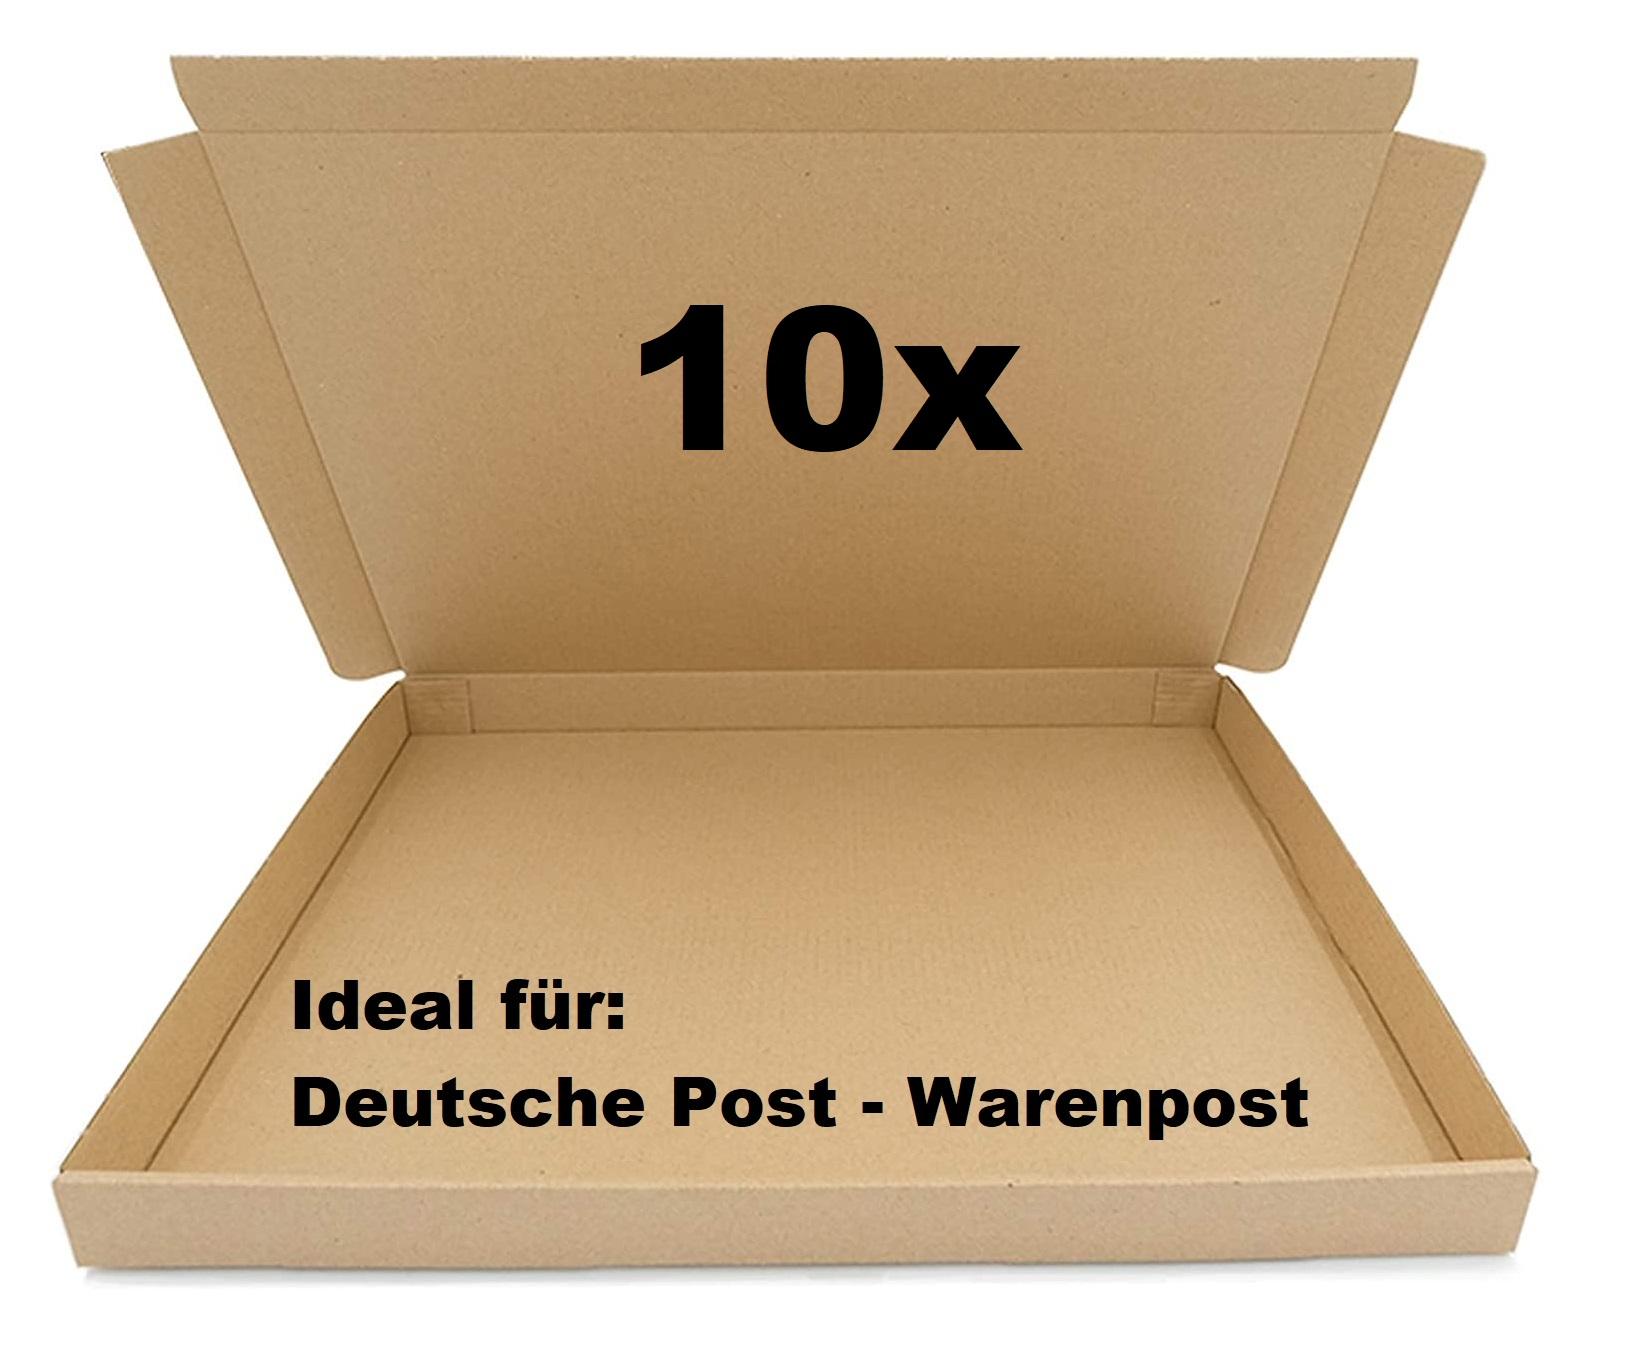 10x SAD Warenpostkartons 350x250x30mm Postkarton für Warenpost International XS geeignet - DIN A4 Fo